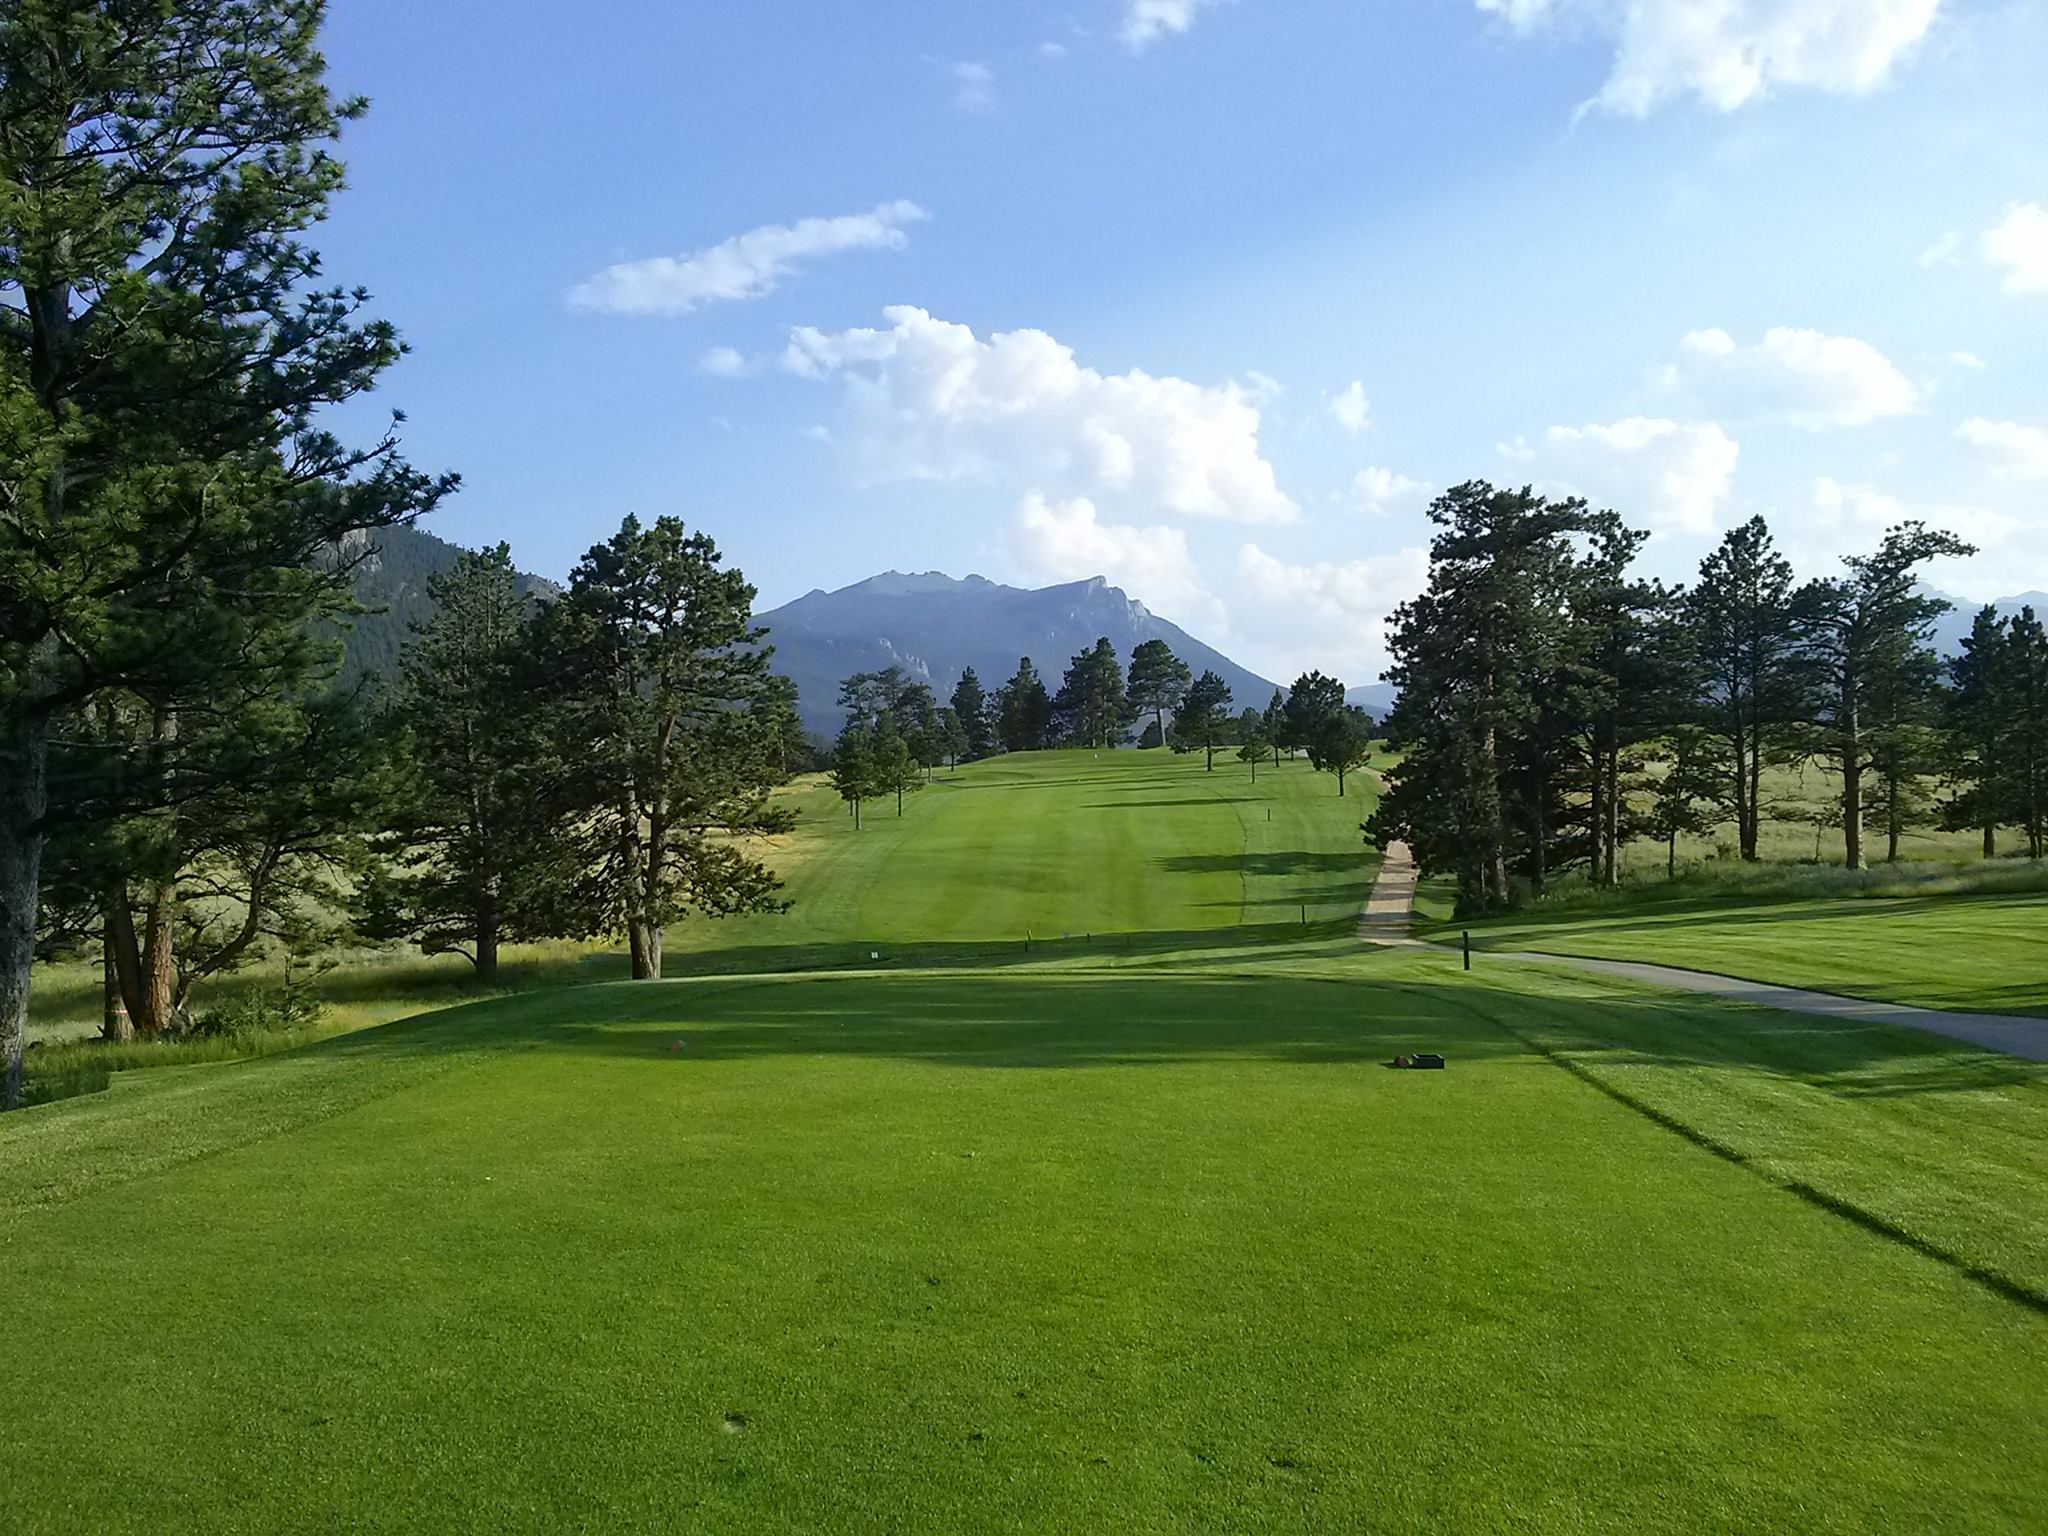 Overview of golf course named Lake Estes Executive 9 Hole Course